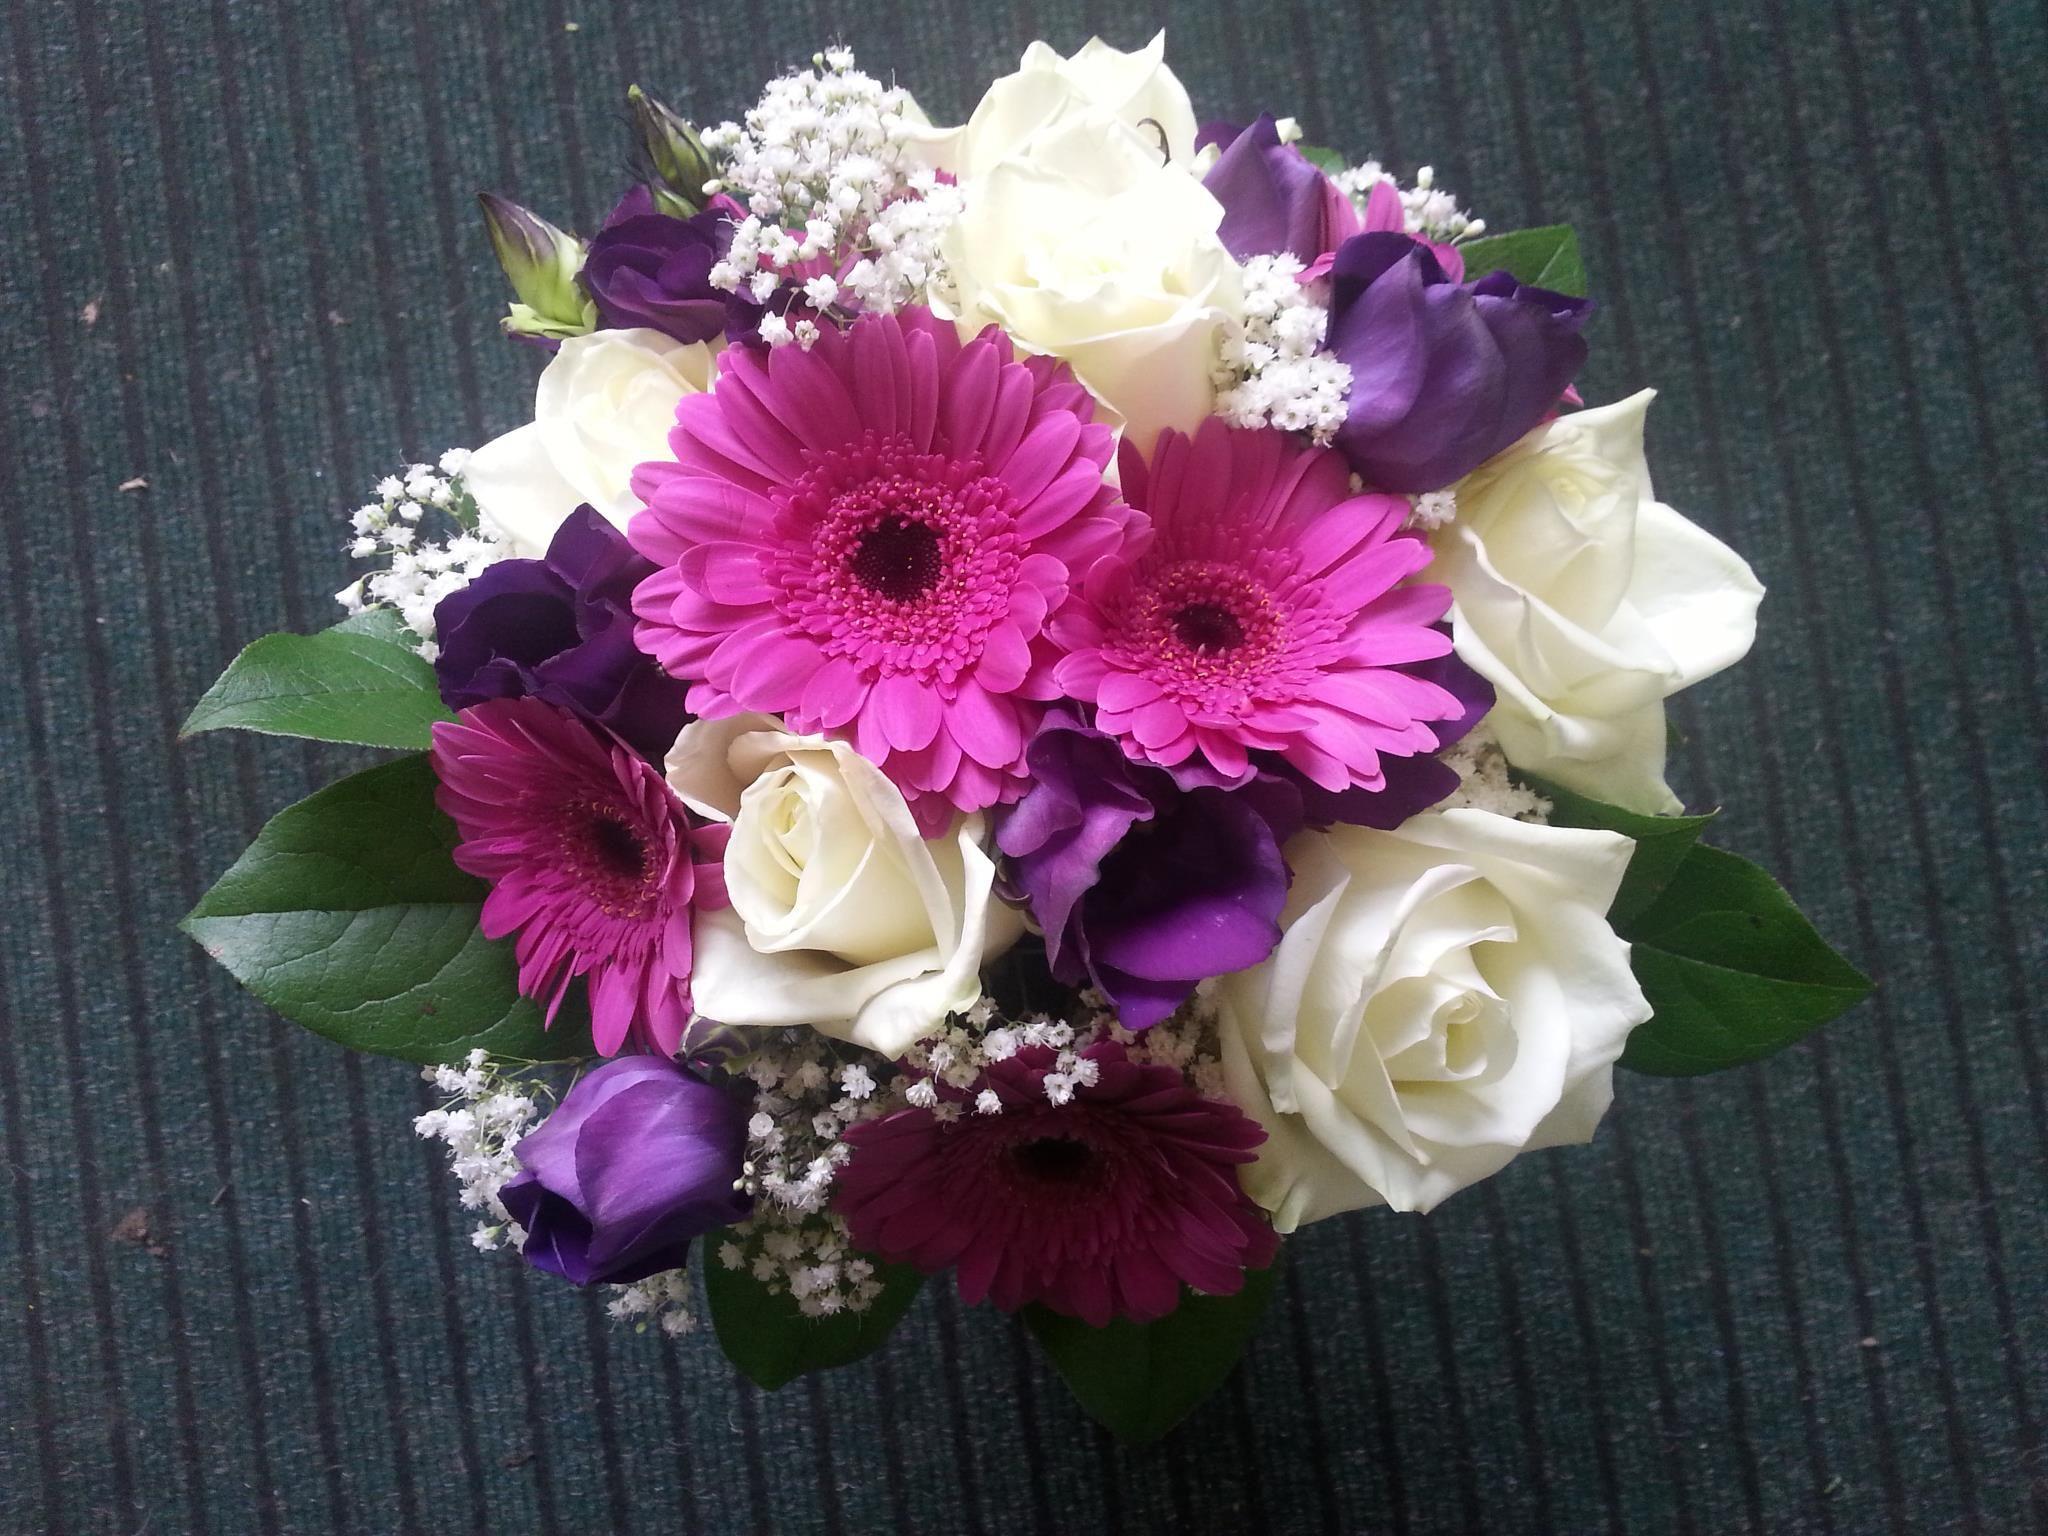 Mixed Bouquet Including Purple Lisianthus, Gerberas